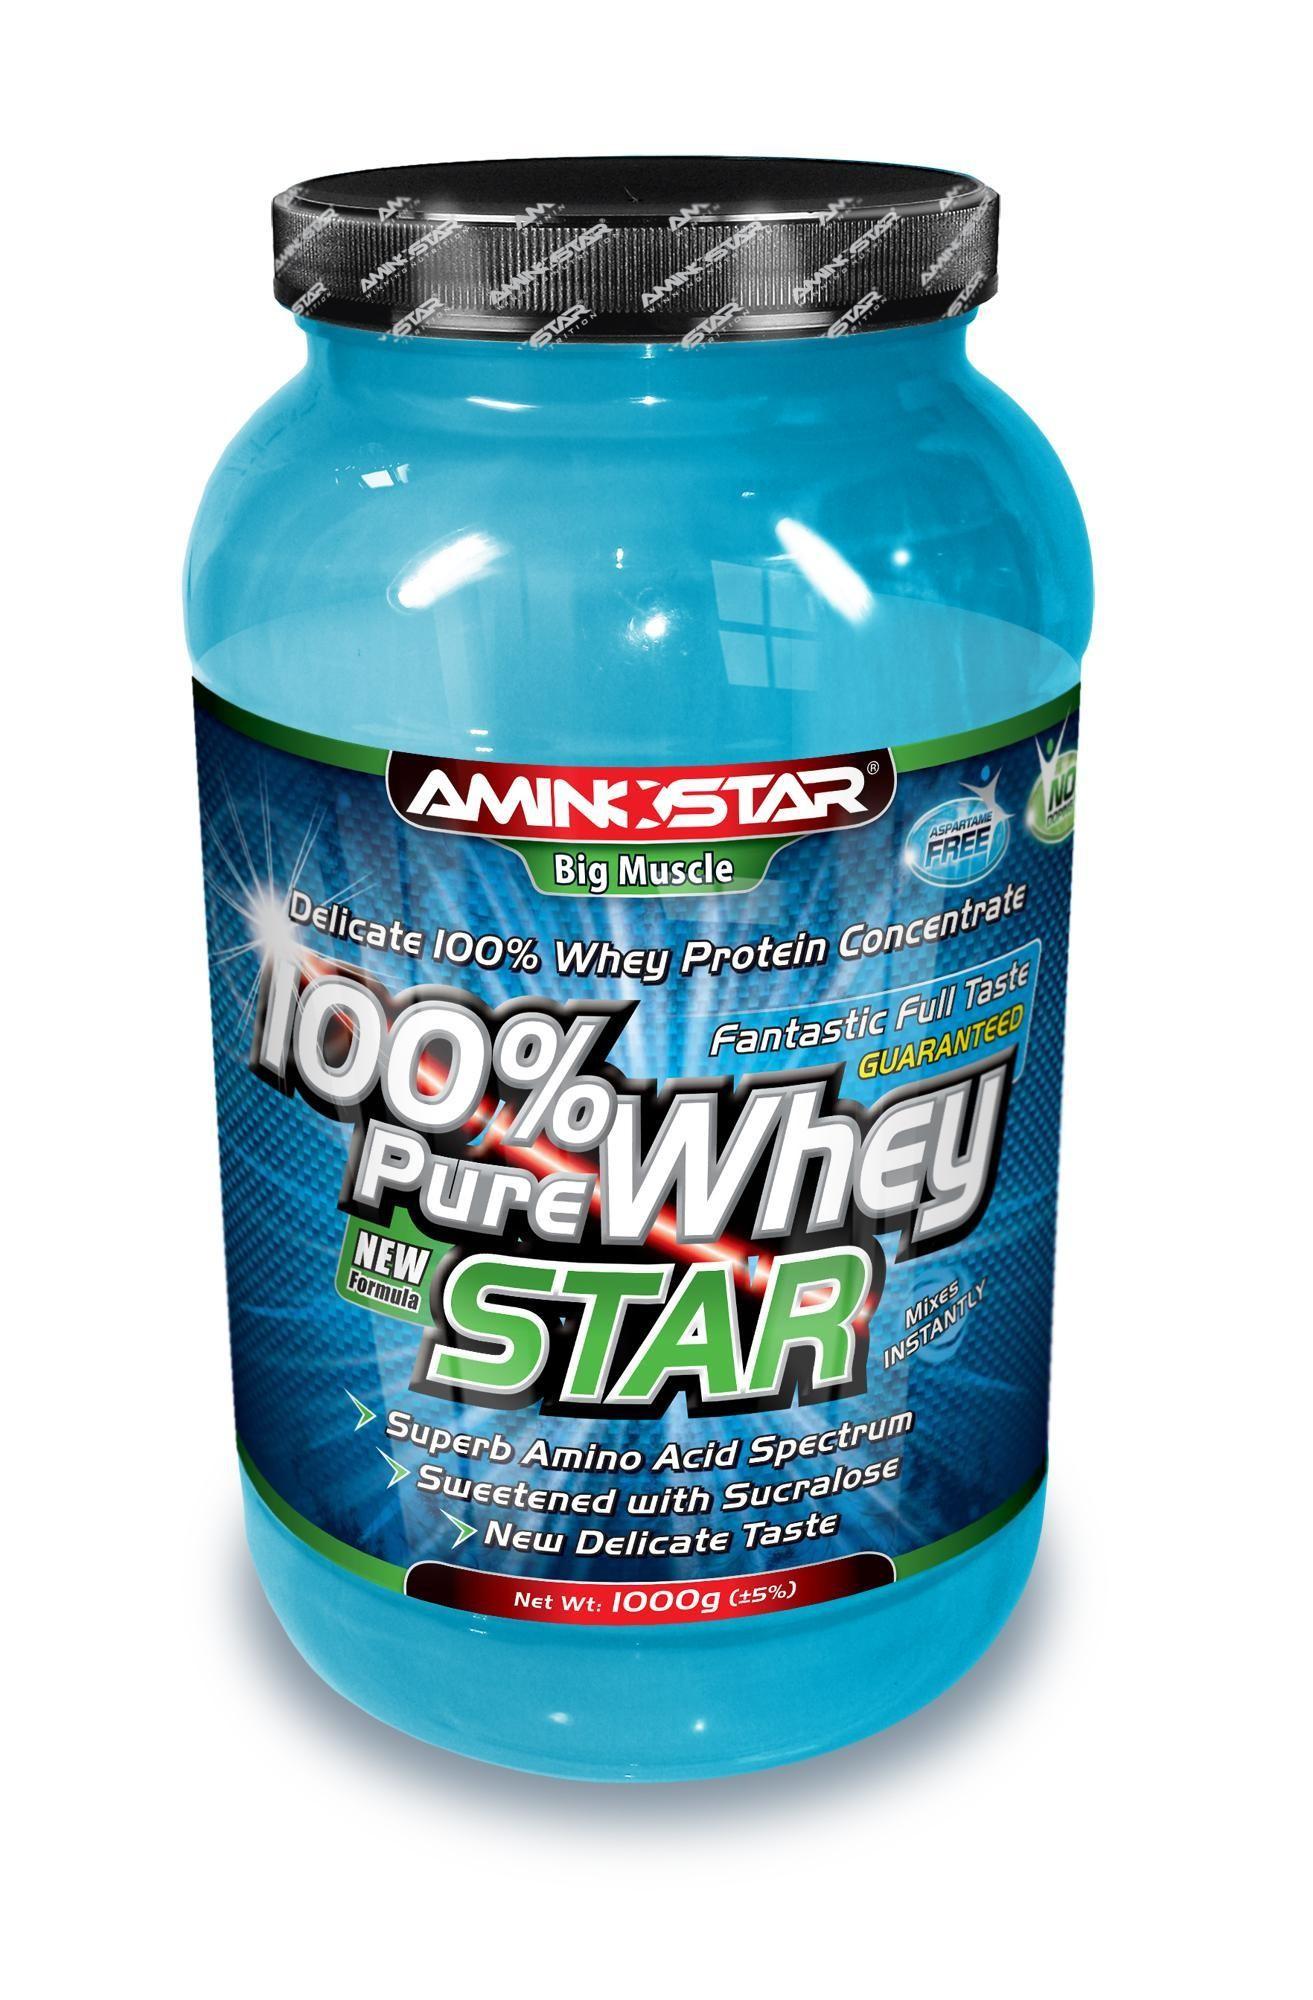 Aminostar 100% Pure Whey Star 1000g